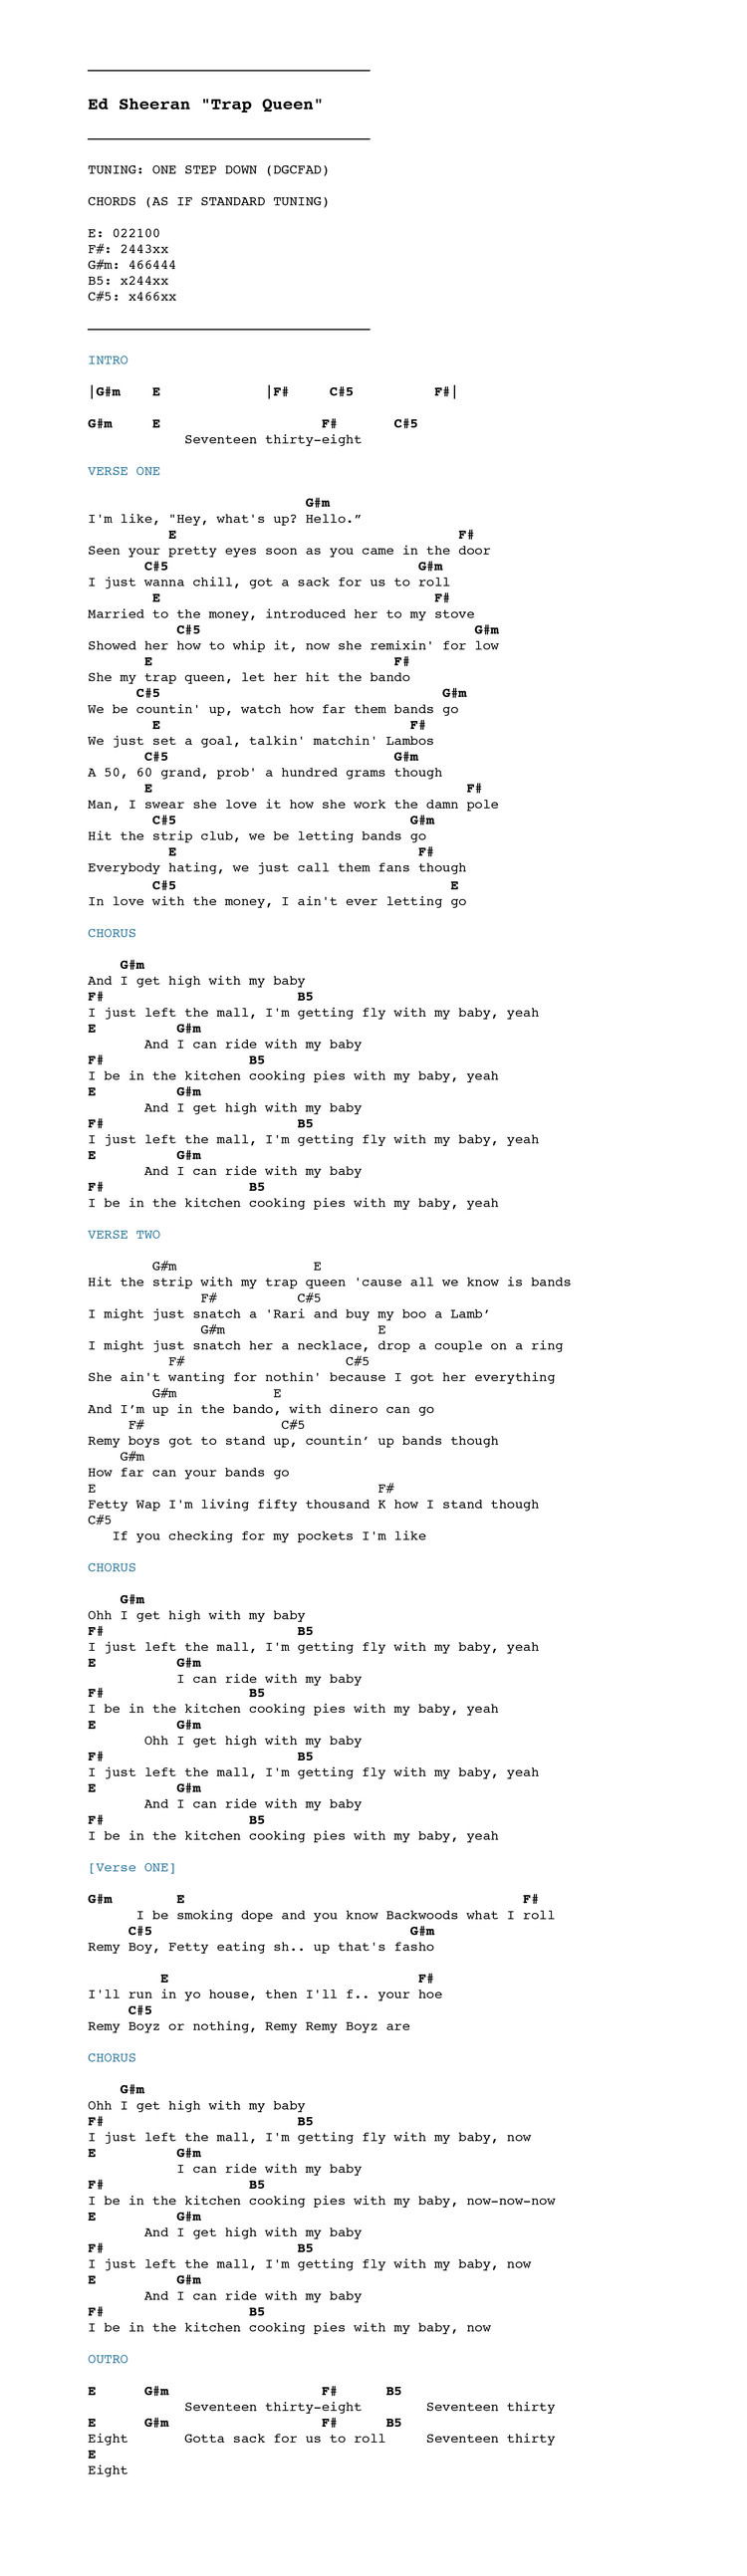 Chordistry Ed Sheeran Alphabetofpromises